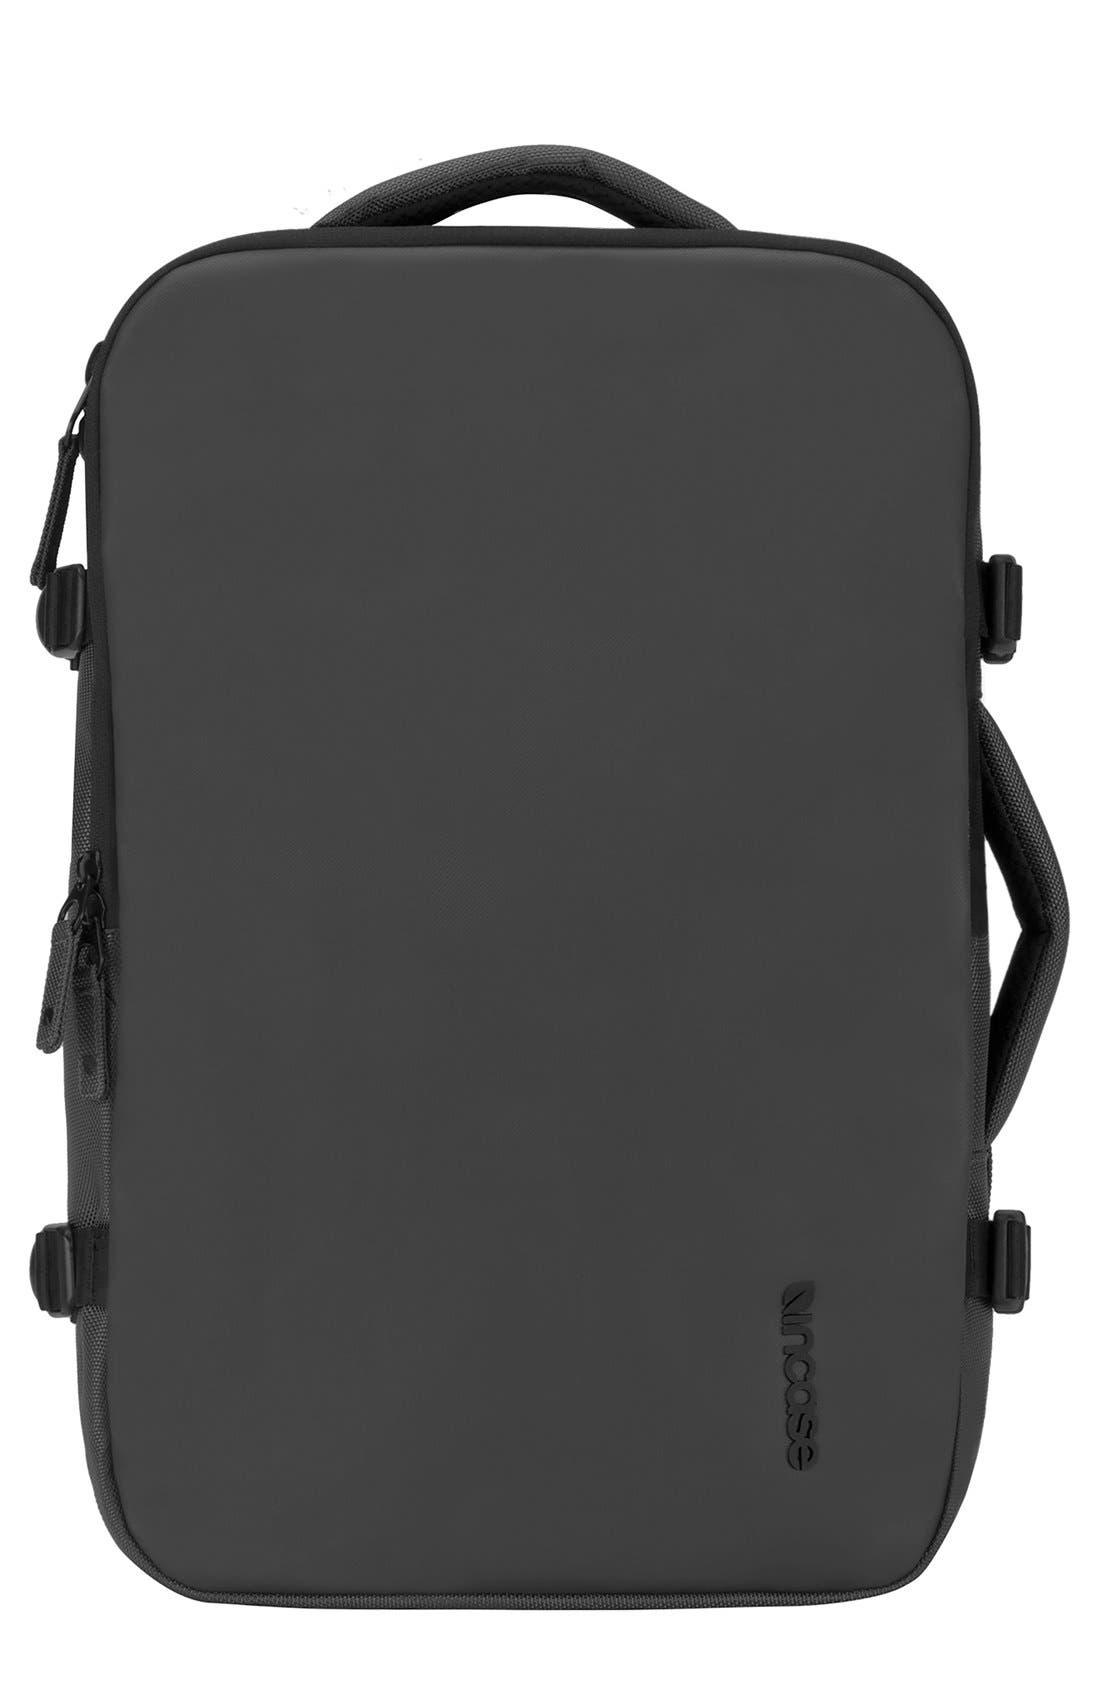 VIA Backpack,                         Main,                         color, 001